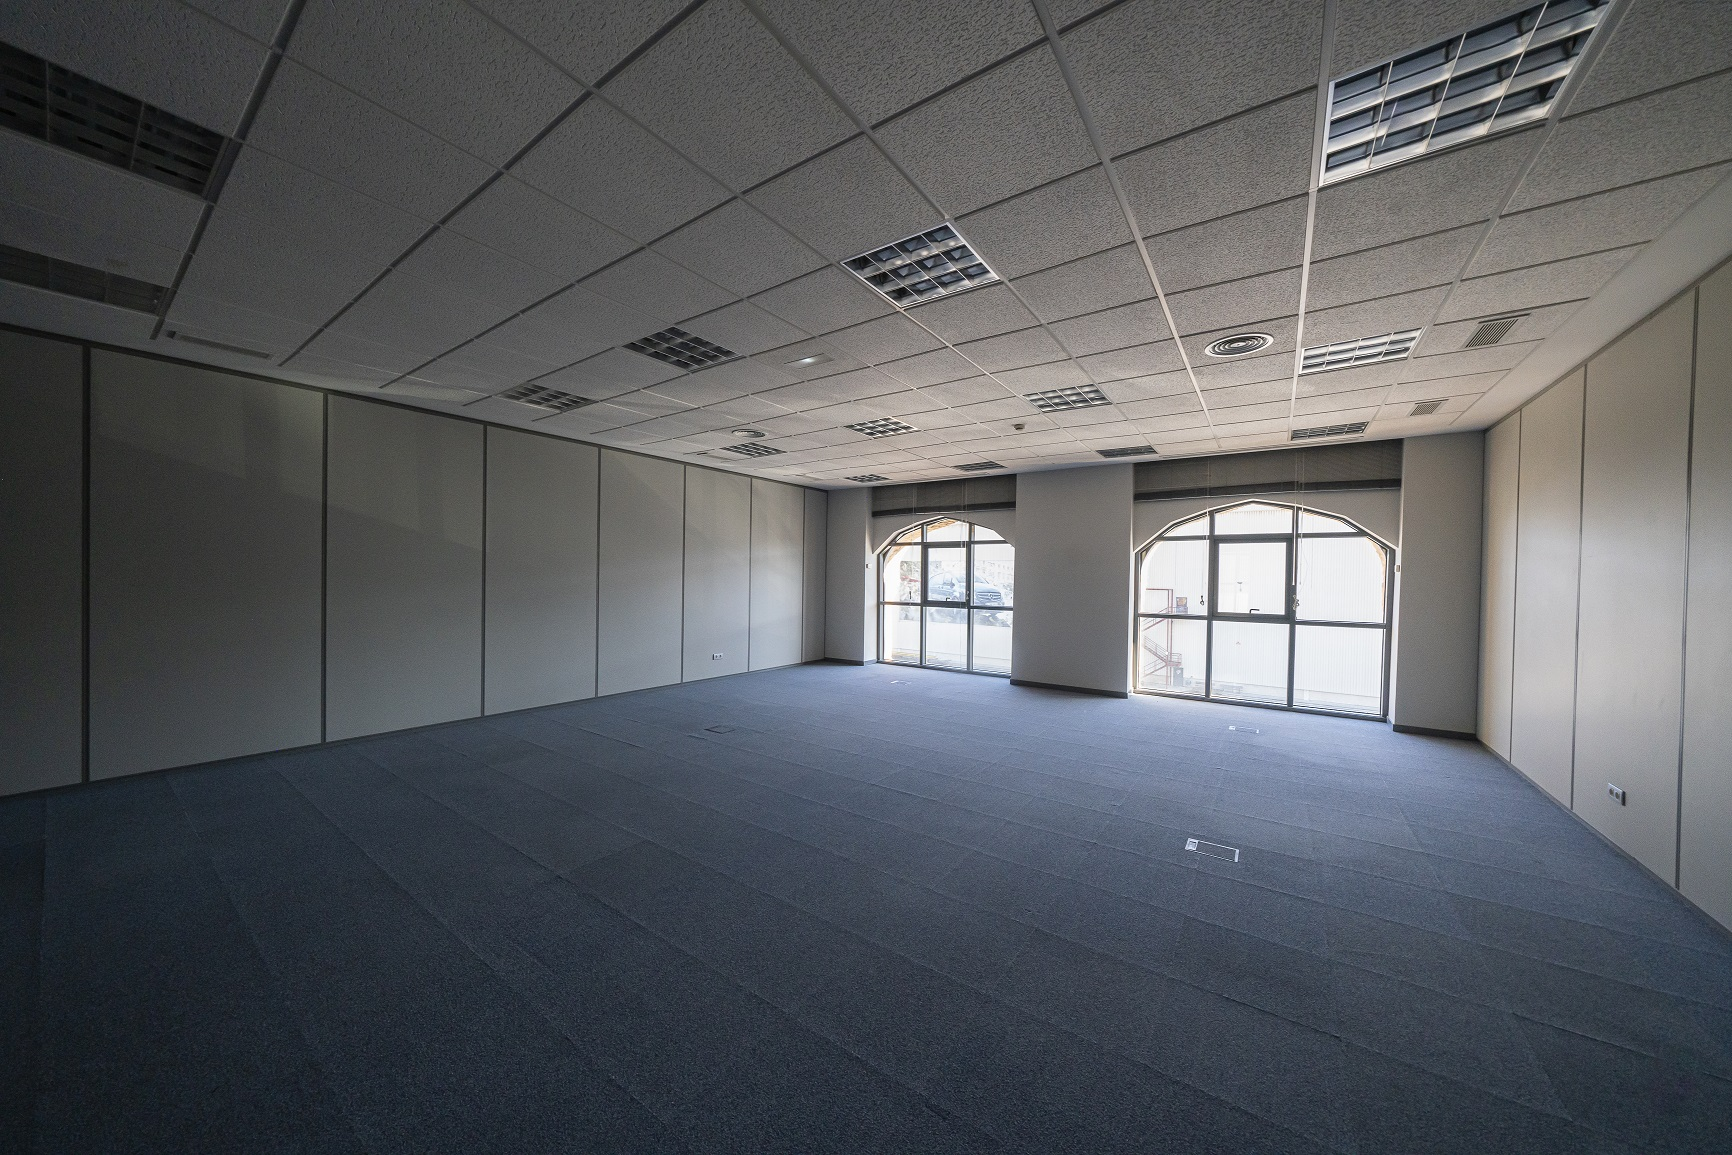 Oficina 3 vista interior